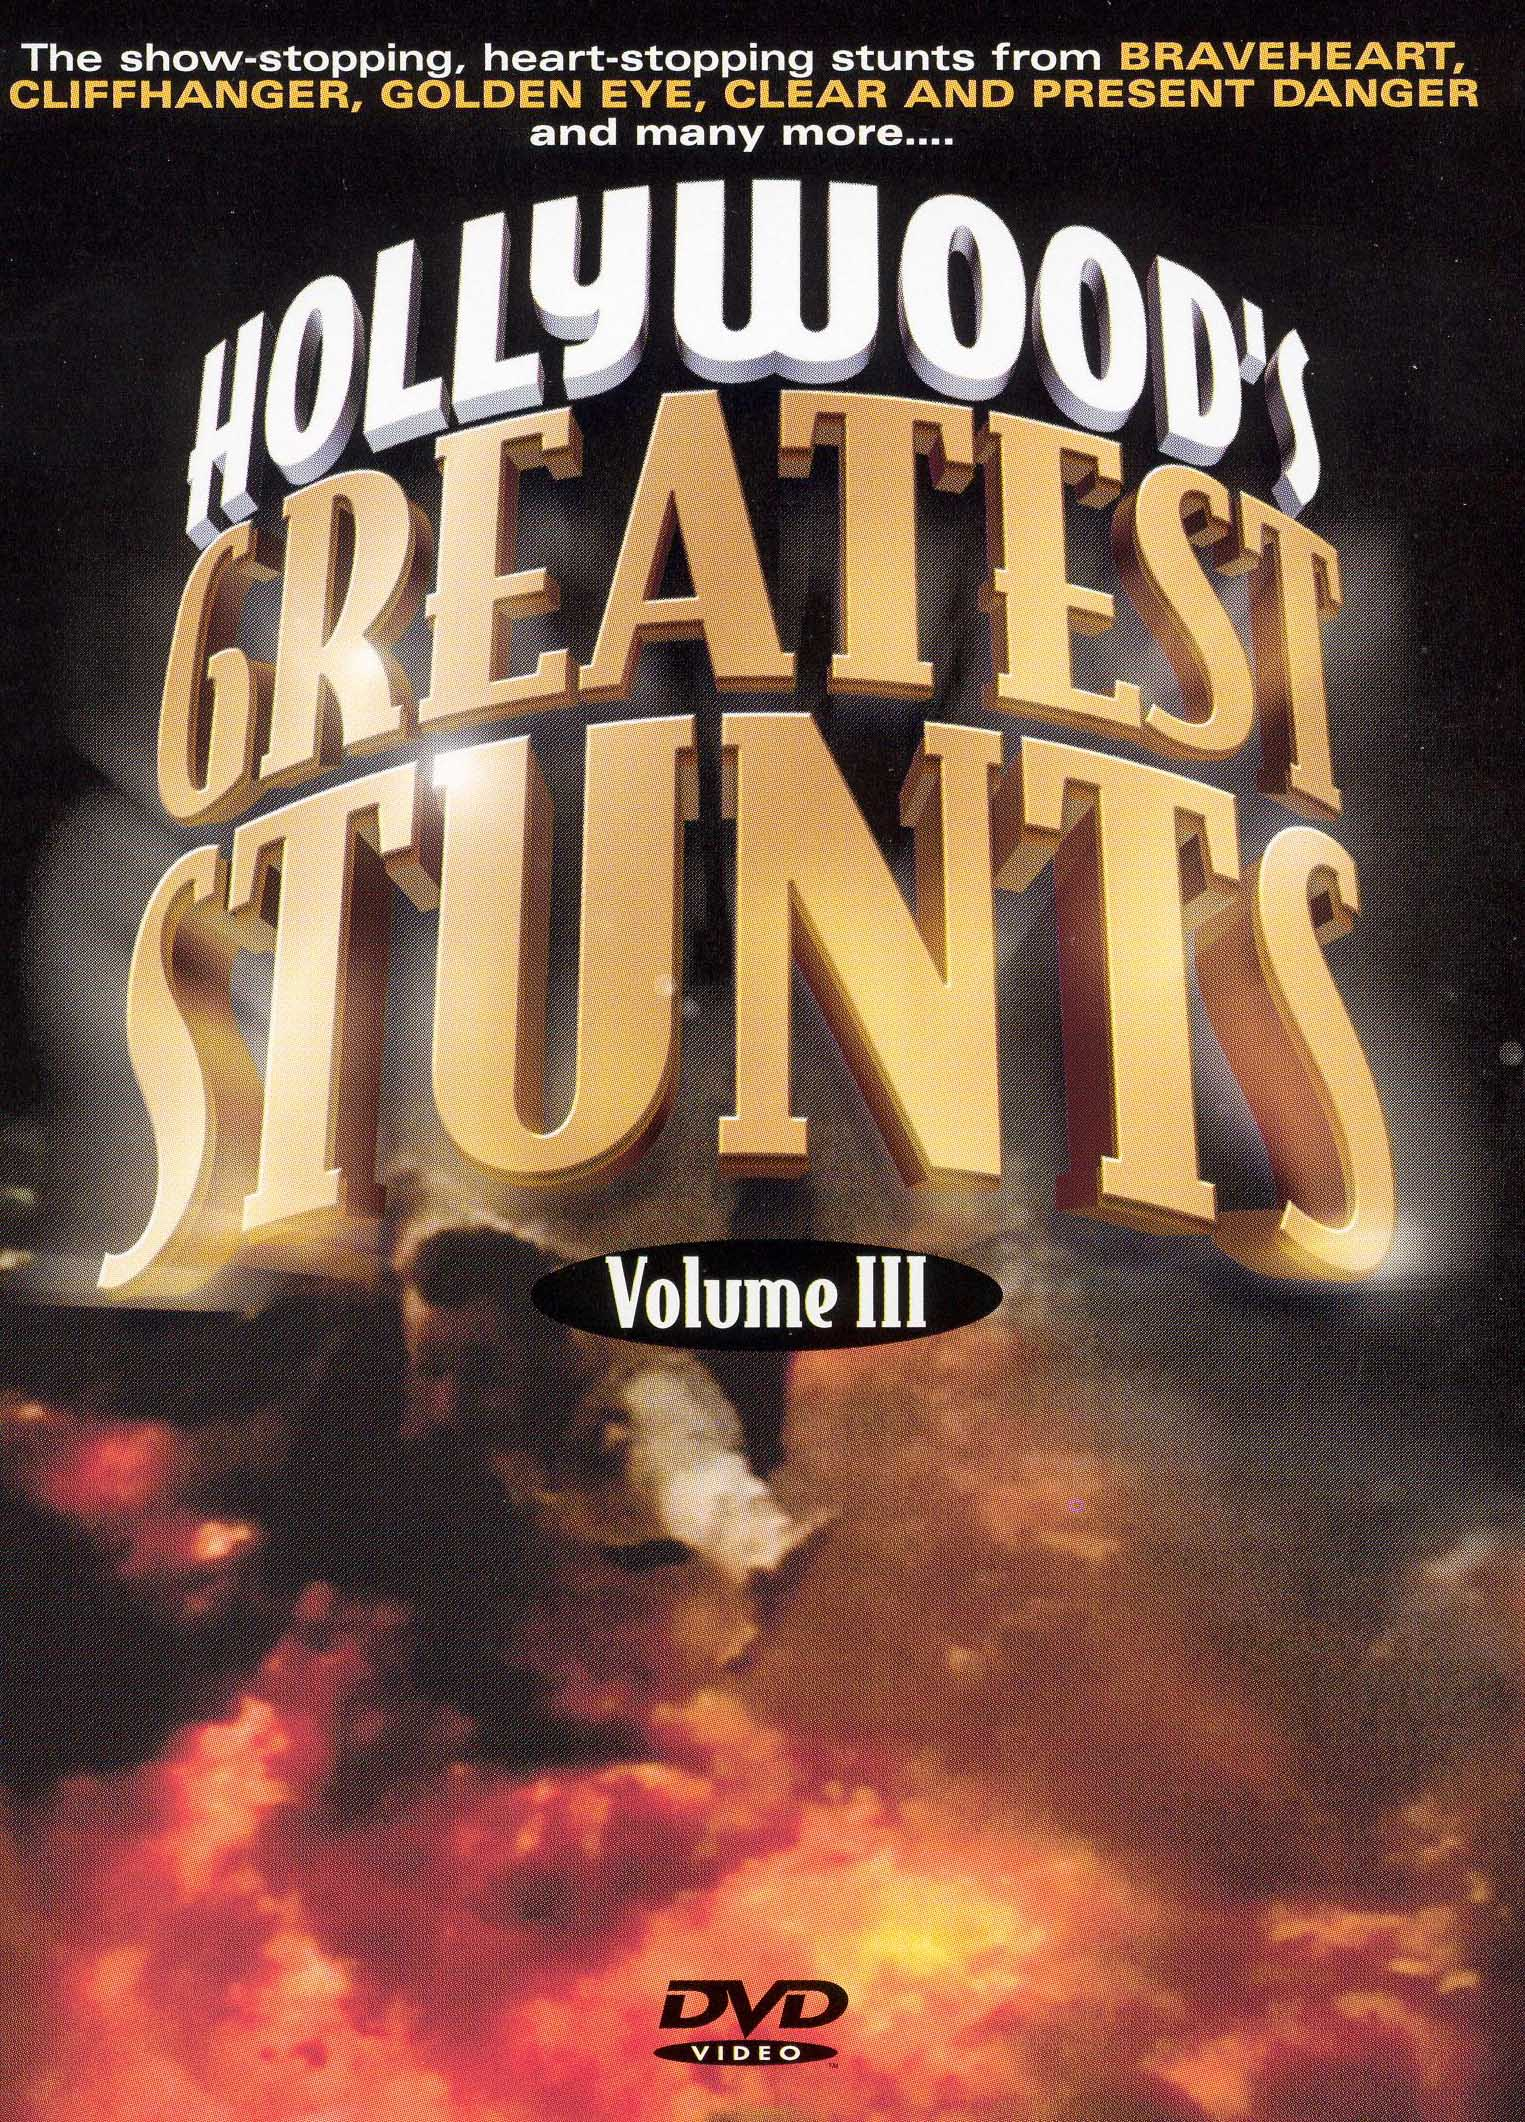 Hollywood's Greatest Stunts, Vol. 3